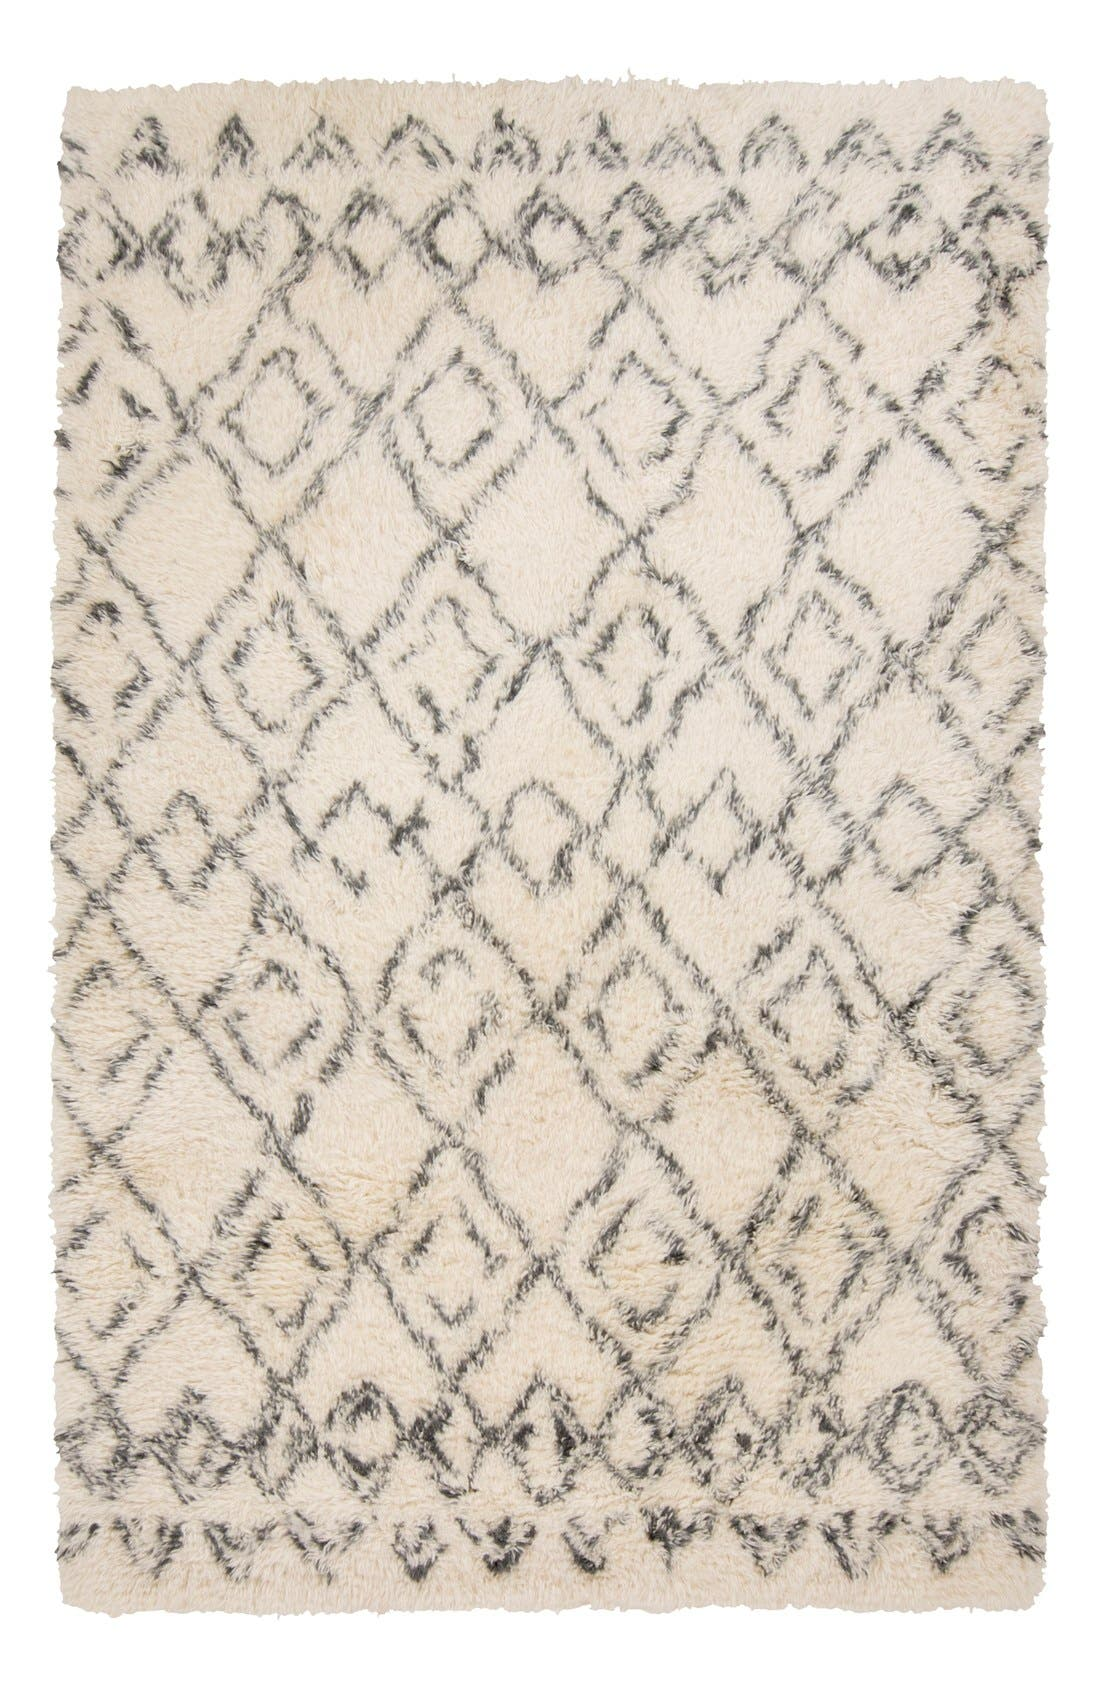 'Tasman' New Zealand Wool Rug,                             Main thumbnail 1, color,                             IVORY/ CHARCOAL